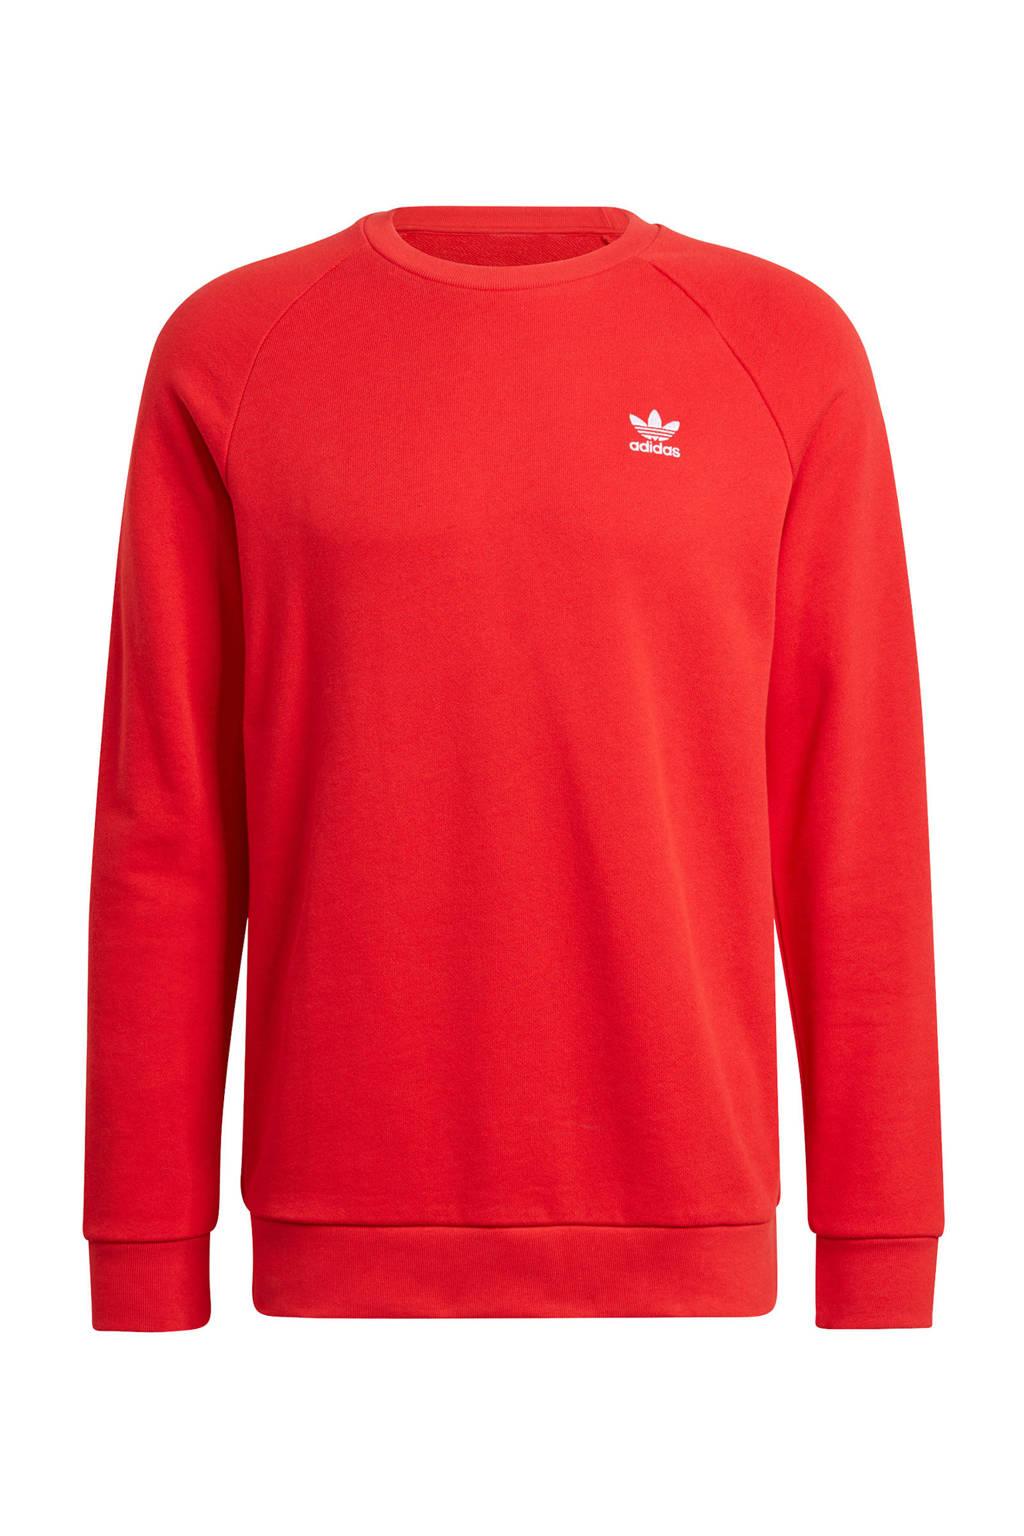 adidas Originals sweater rood/wit, Rood/wit